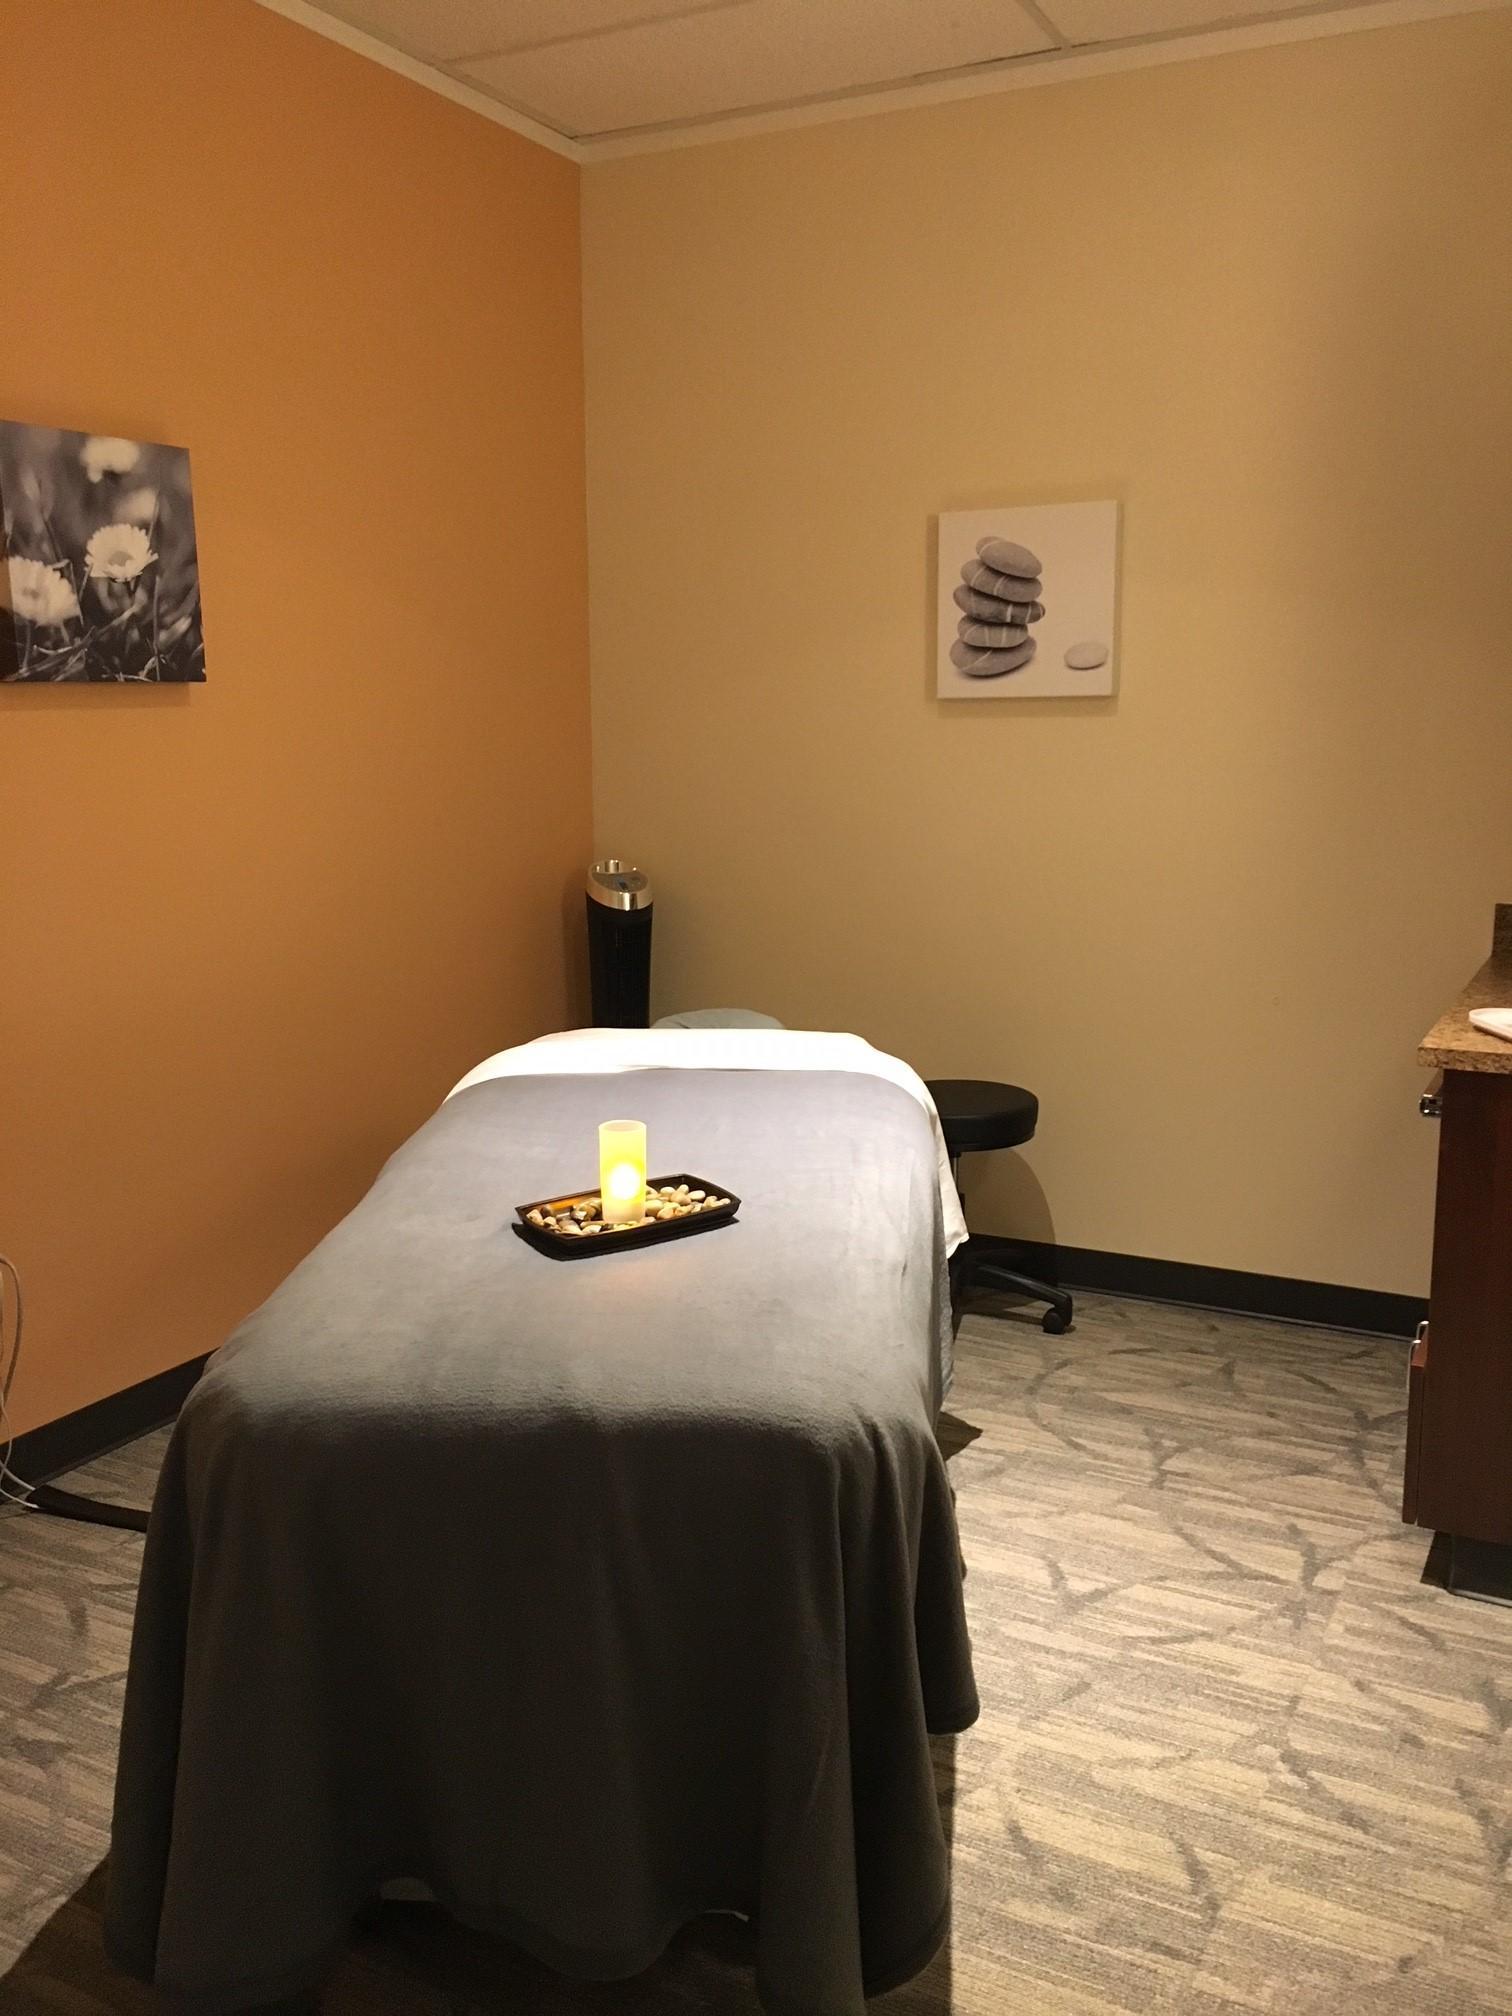 Massage Therapy Room - Hand & Stone Massage and Facial Spa - Kirkland, Washington